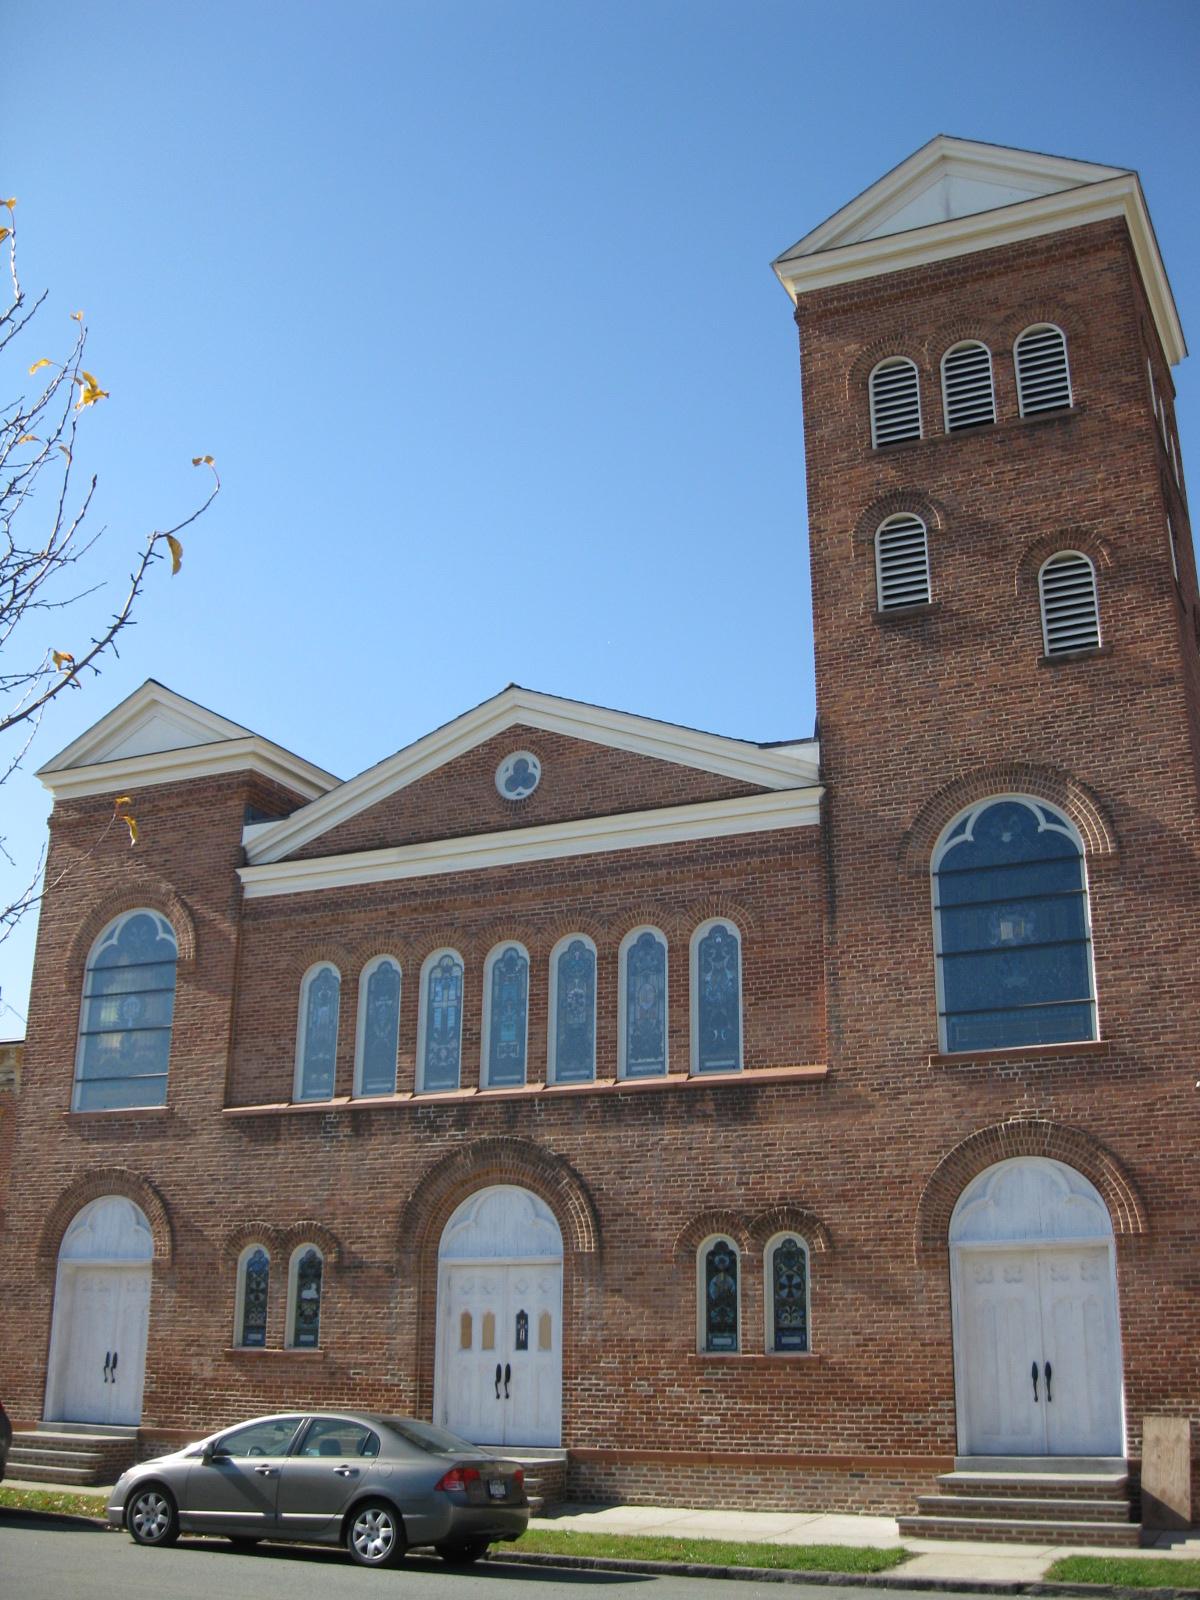 Lovely Catholic Church New Albany Ohio #3: Ohio_Street_Methodist_Episcopal_Church_Complex_Oct_09.jpg